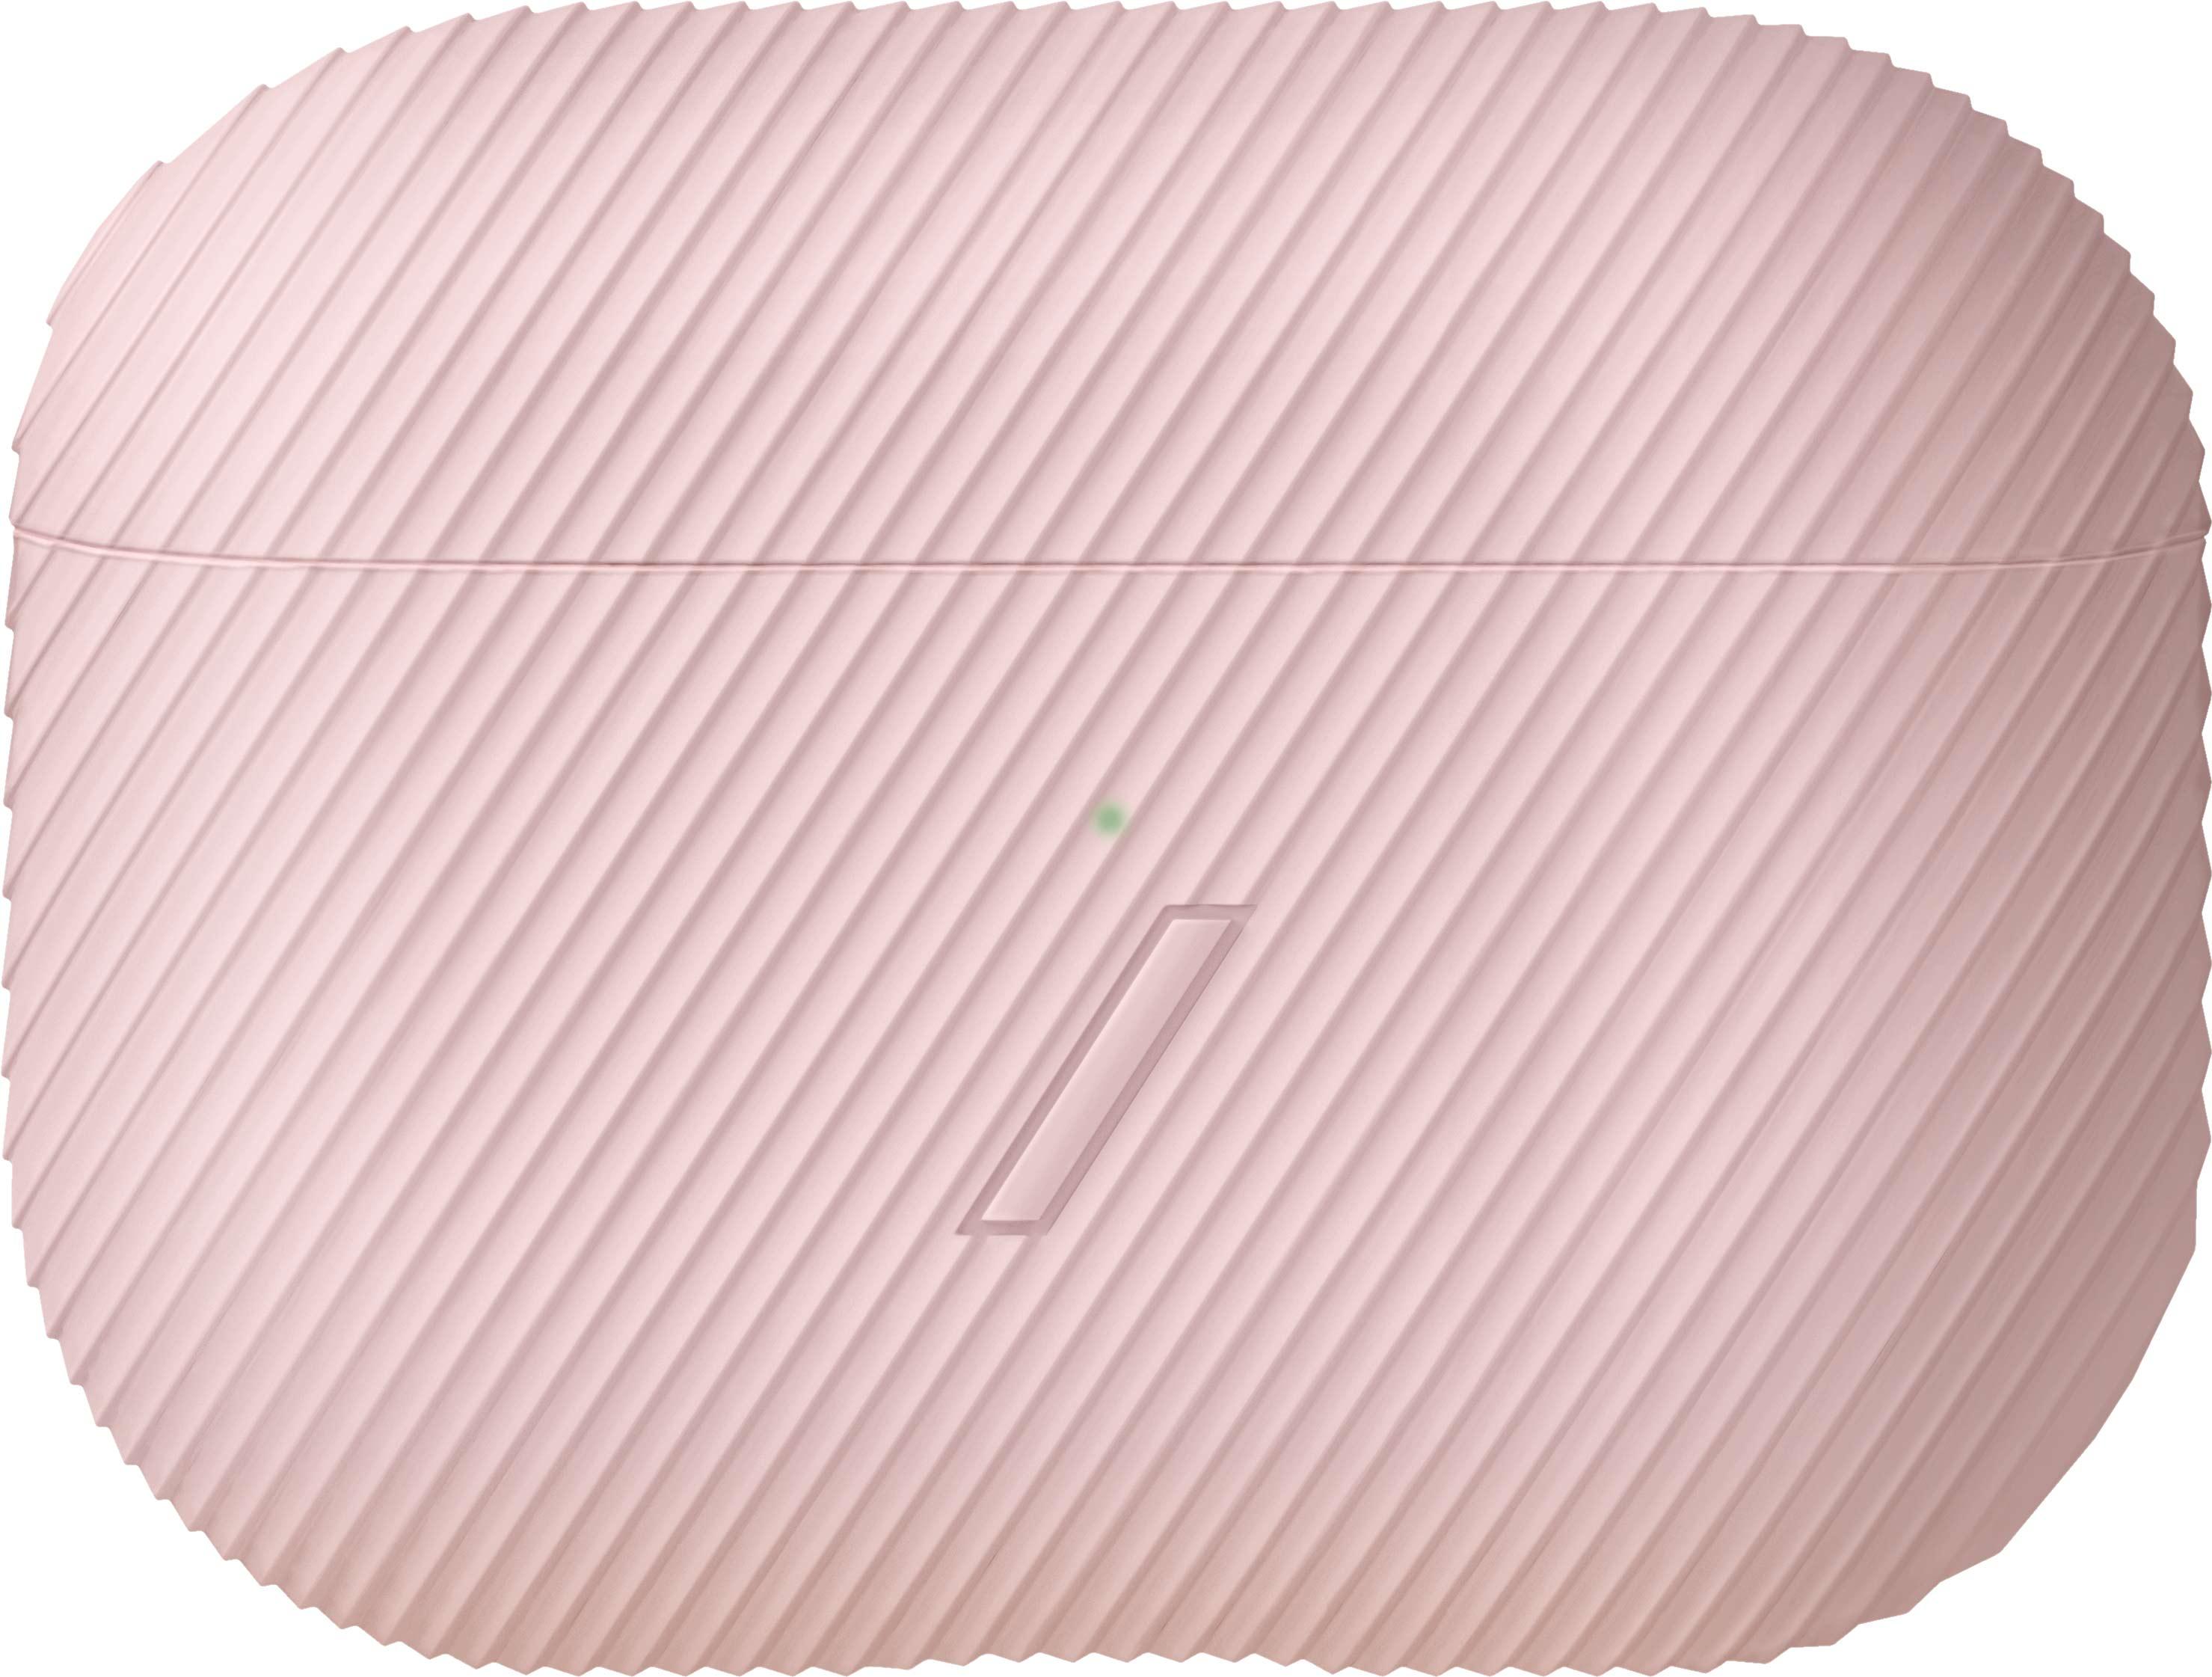 Чехол Native Union для AirPods Pro, силикон, розовый